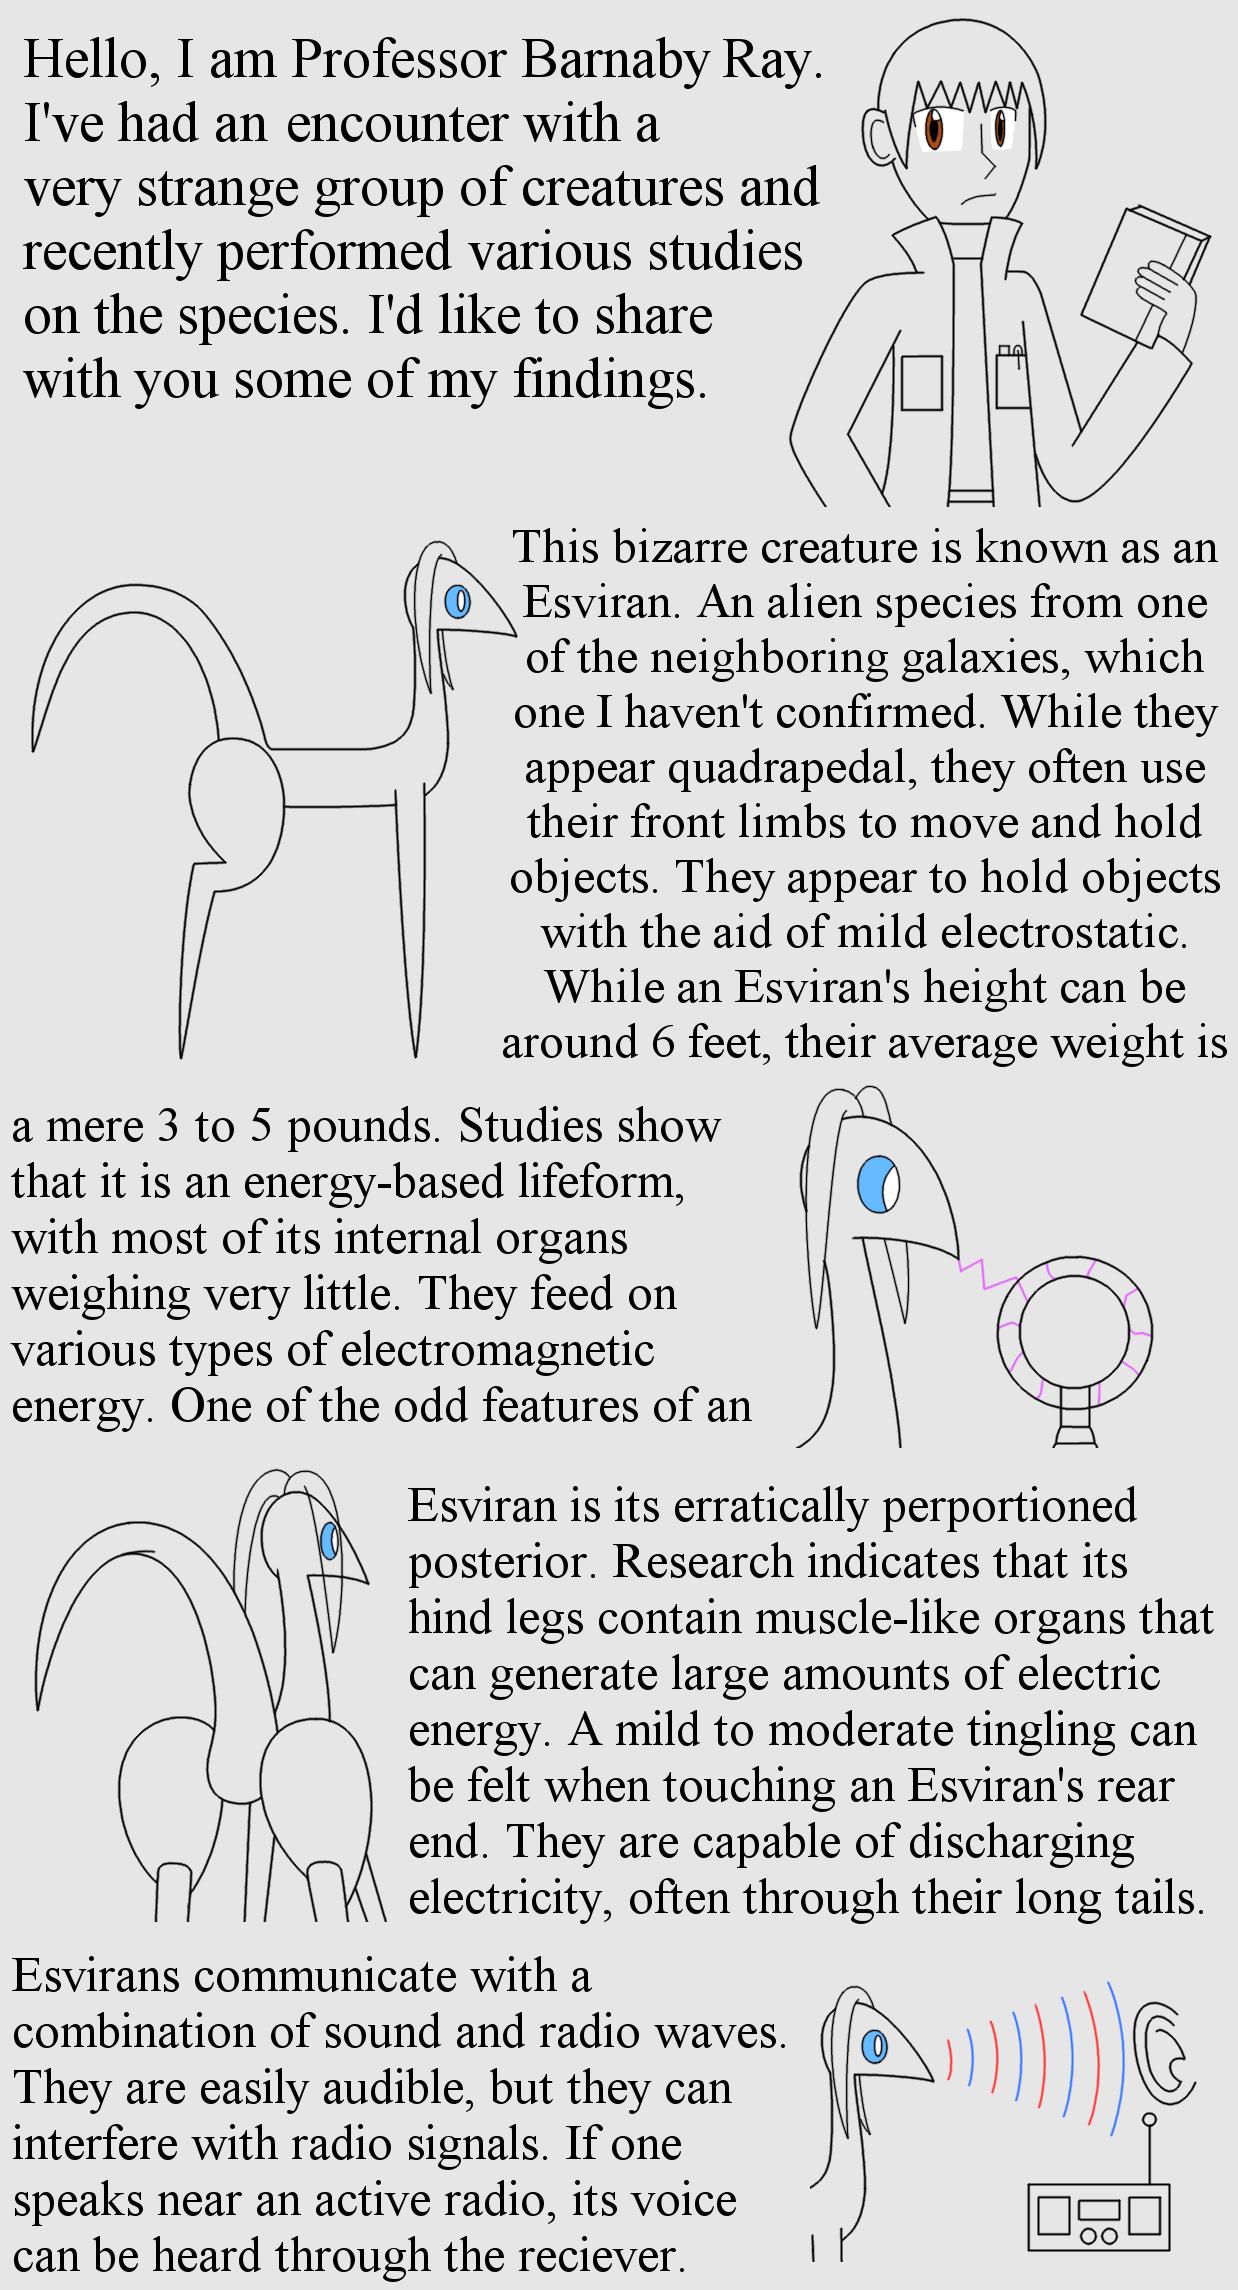 Esviran Research Page